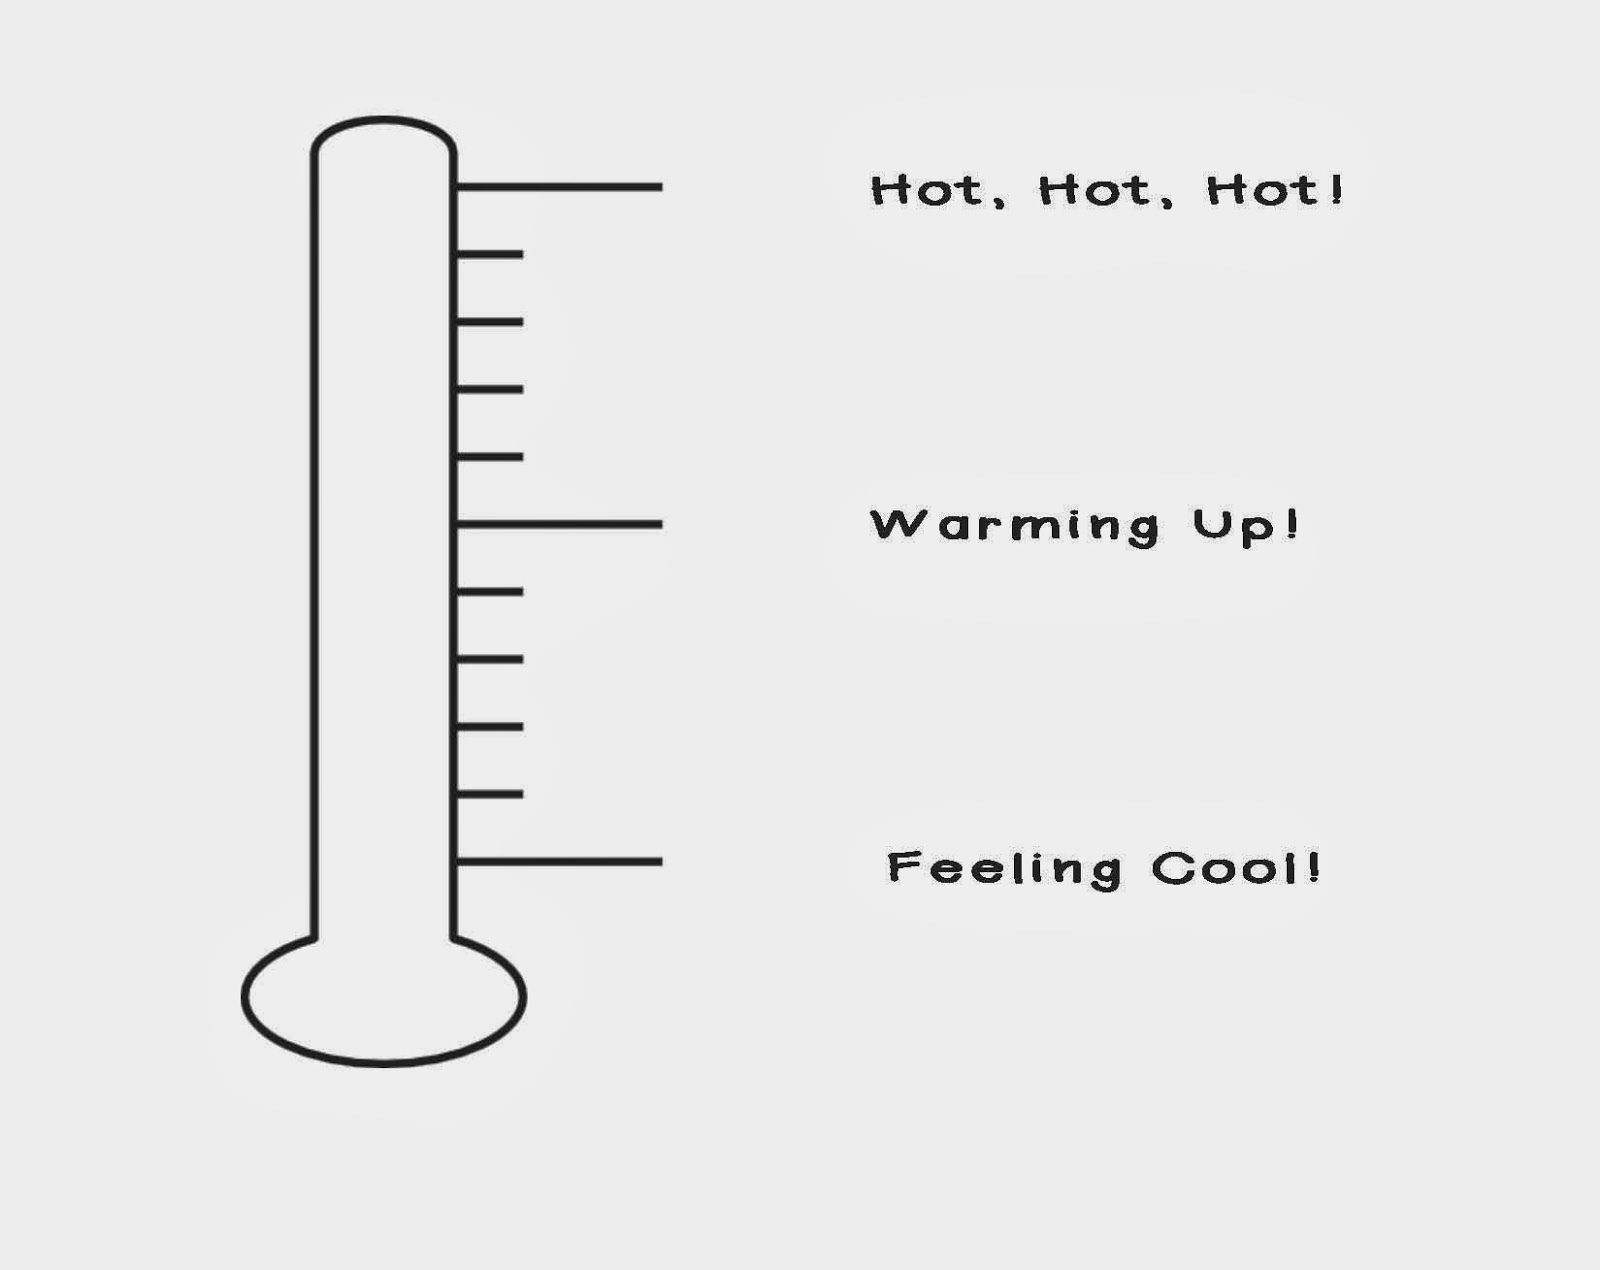 Anger Thermometer Worksheet